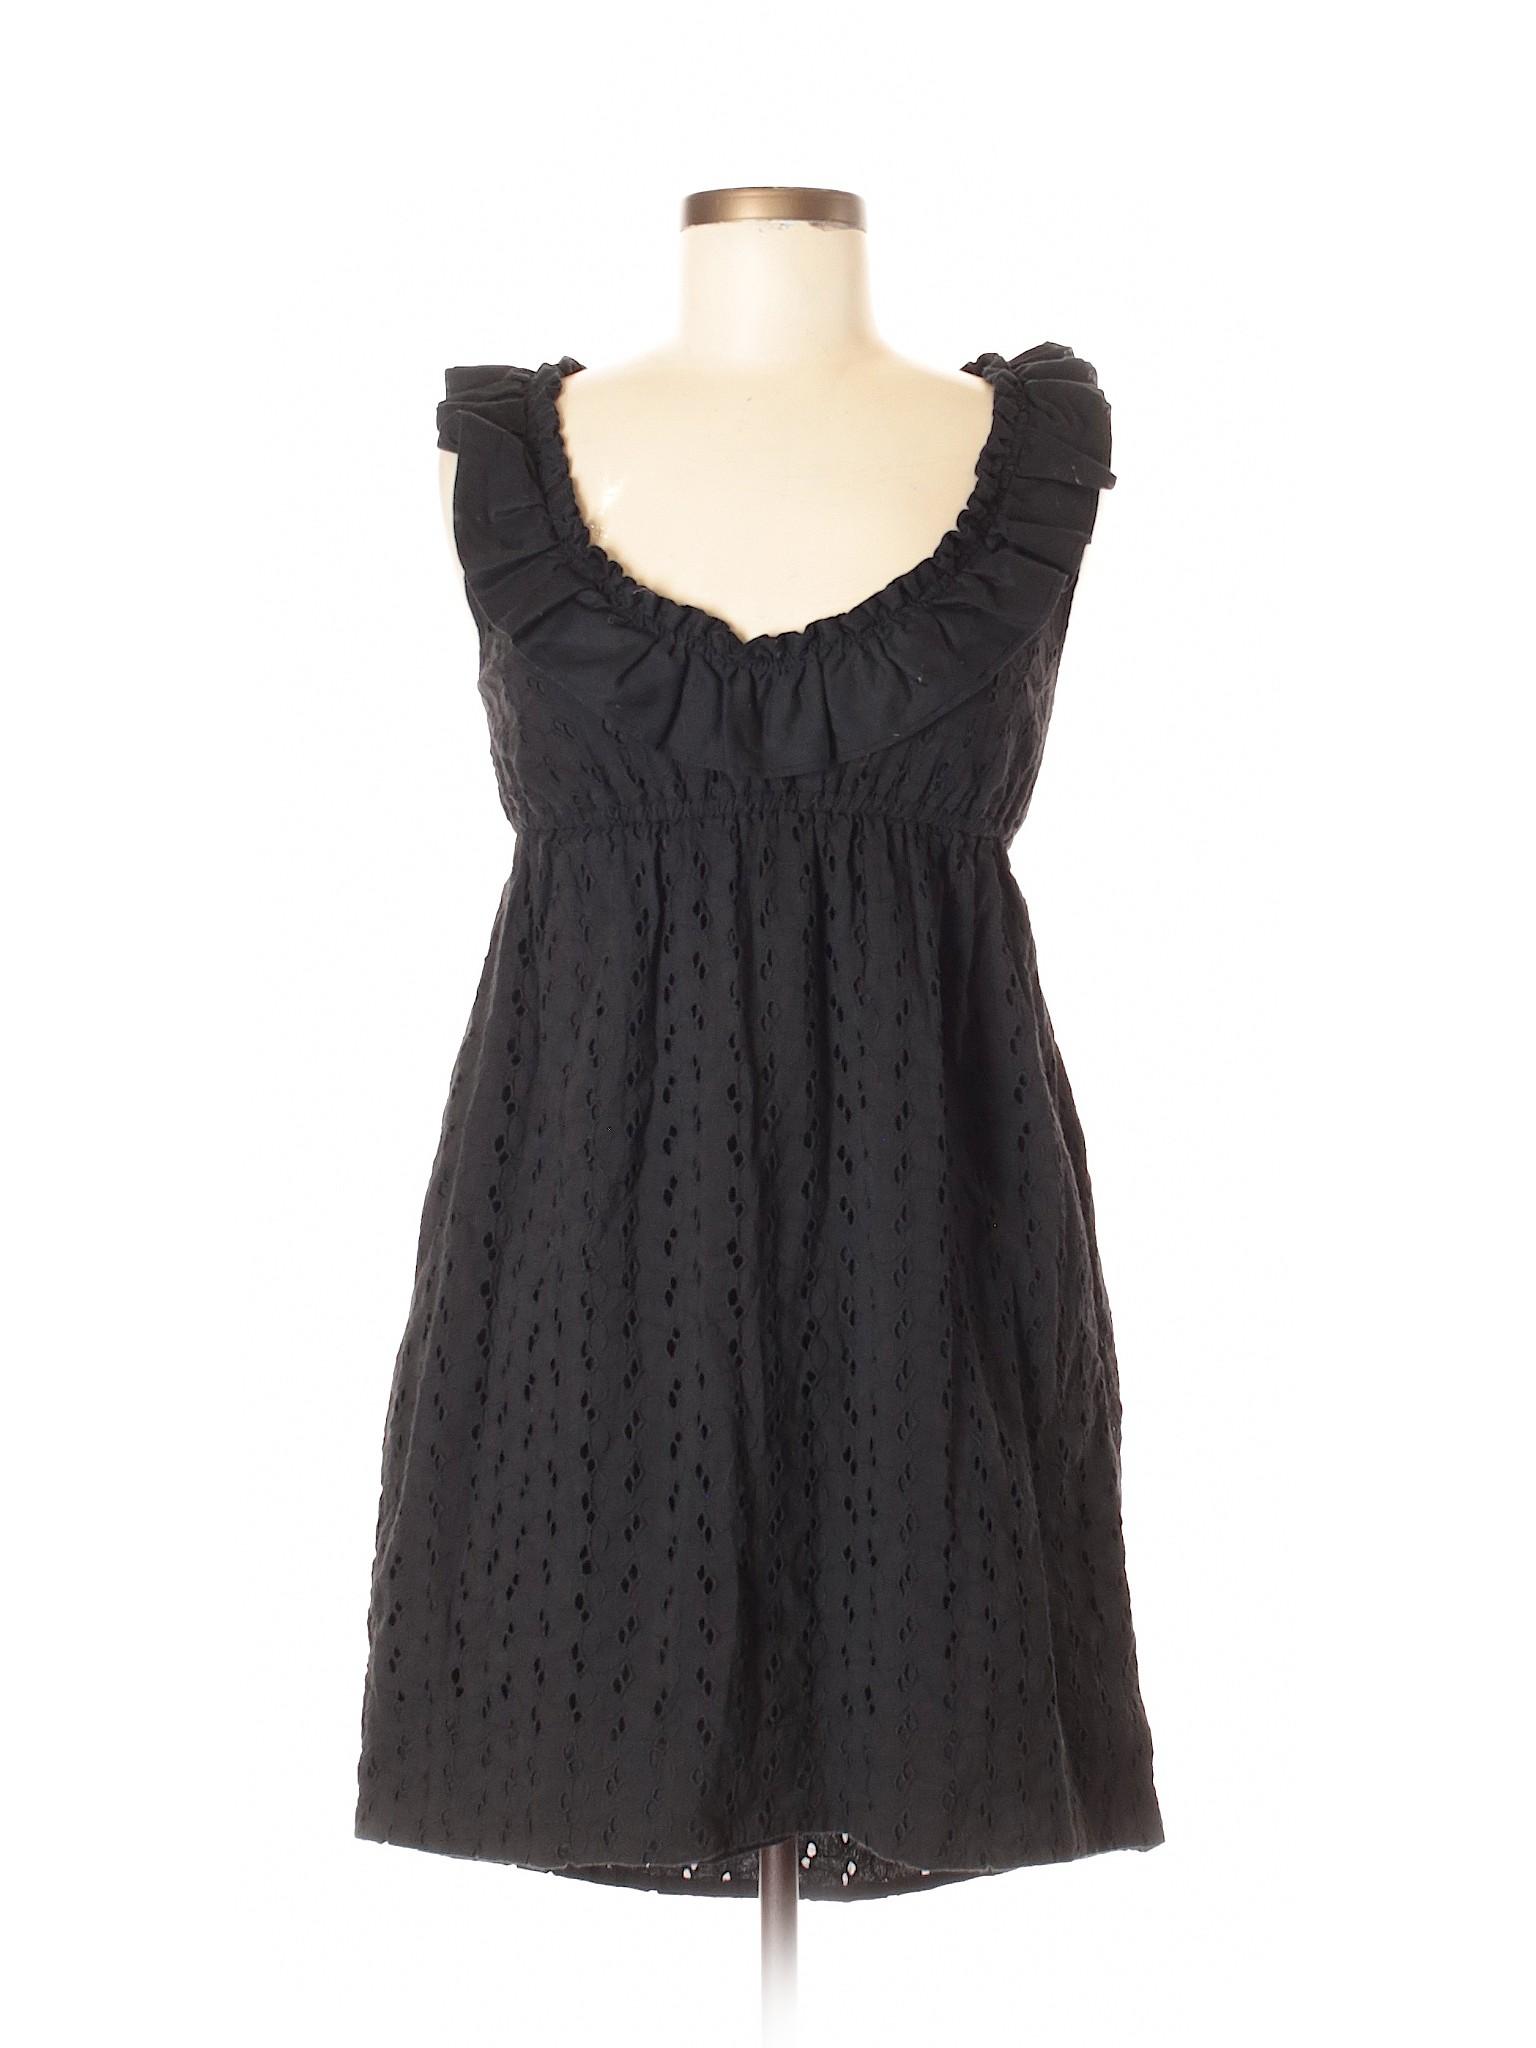 Dress Dress BCBGeneration BCBGeneration Selling Dress Selling Casual Casual Casual Selling BCBGeneration Selling SwTAWq